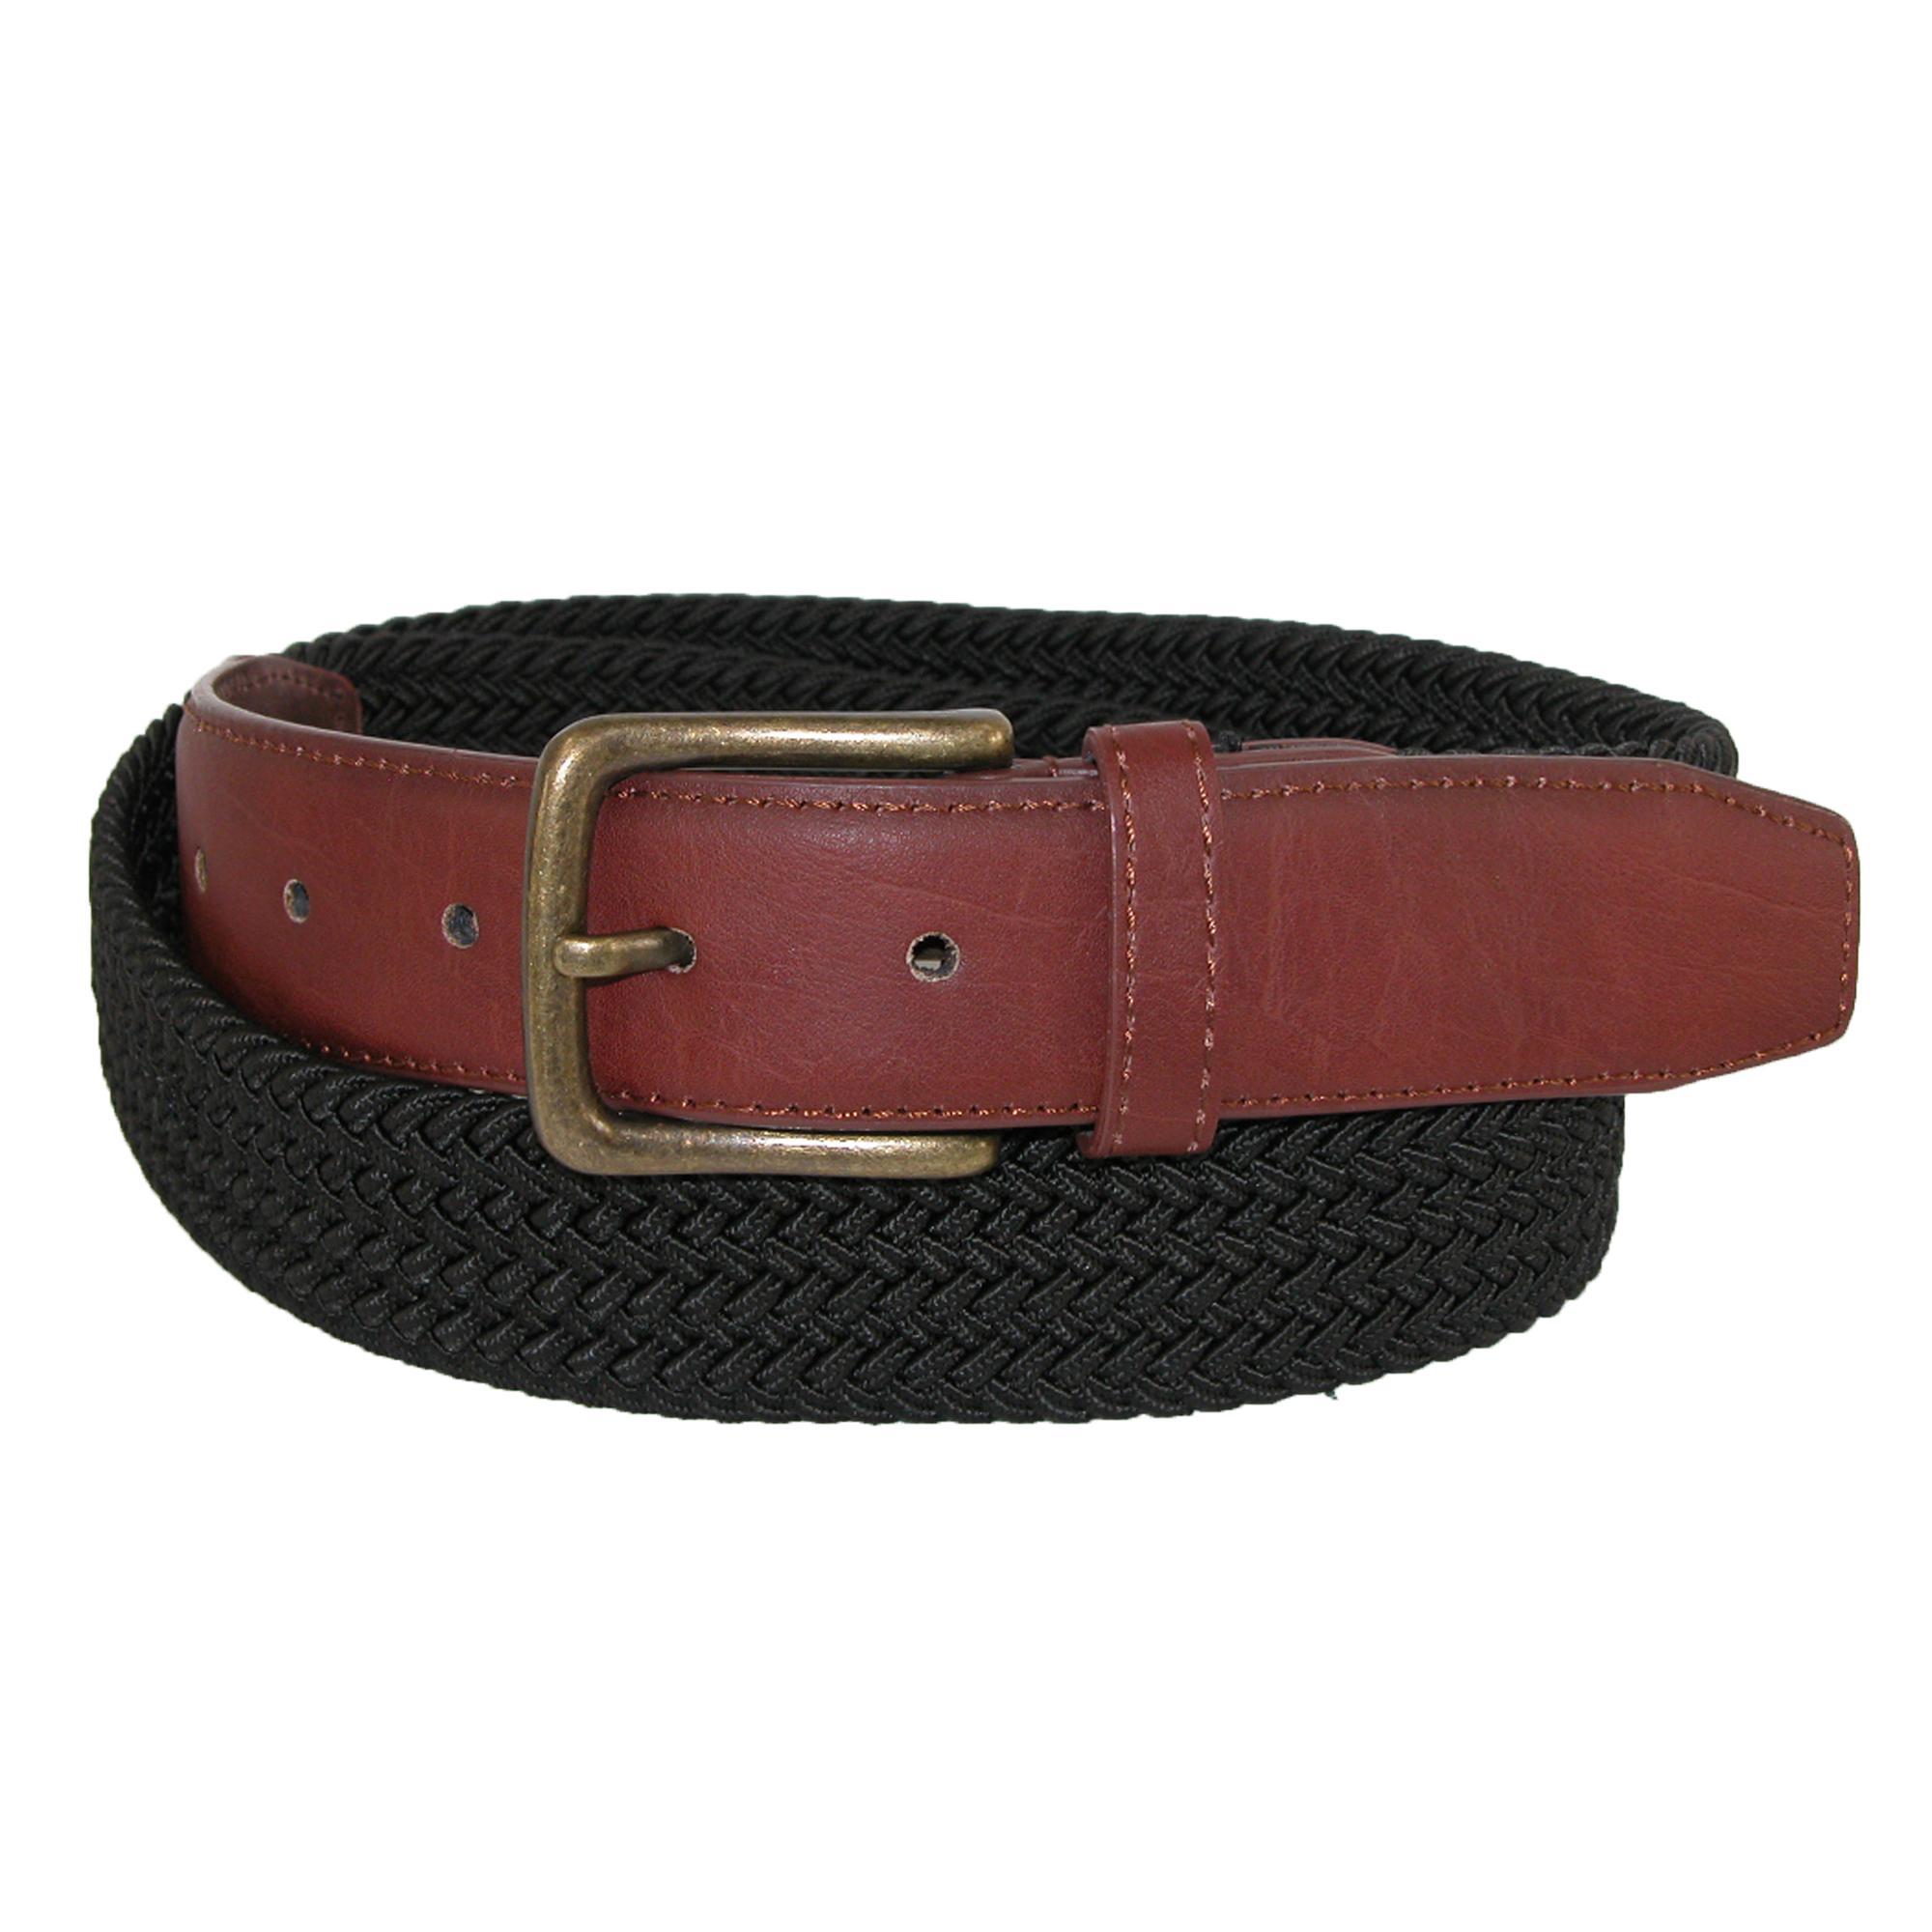 Ctm Mens Elastic Braided 1 1/4 Inch Golf Belt